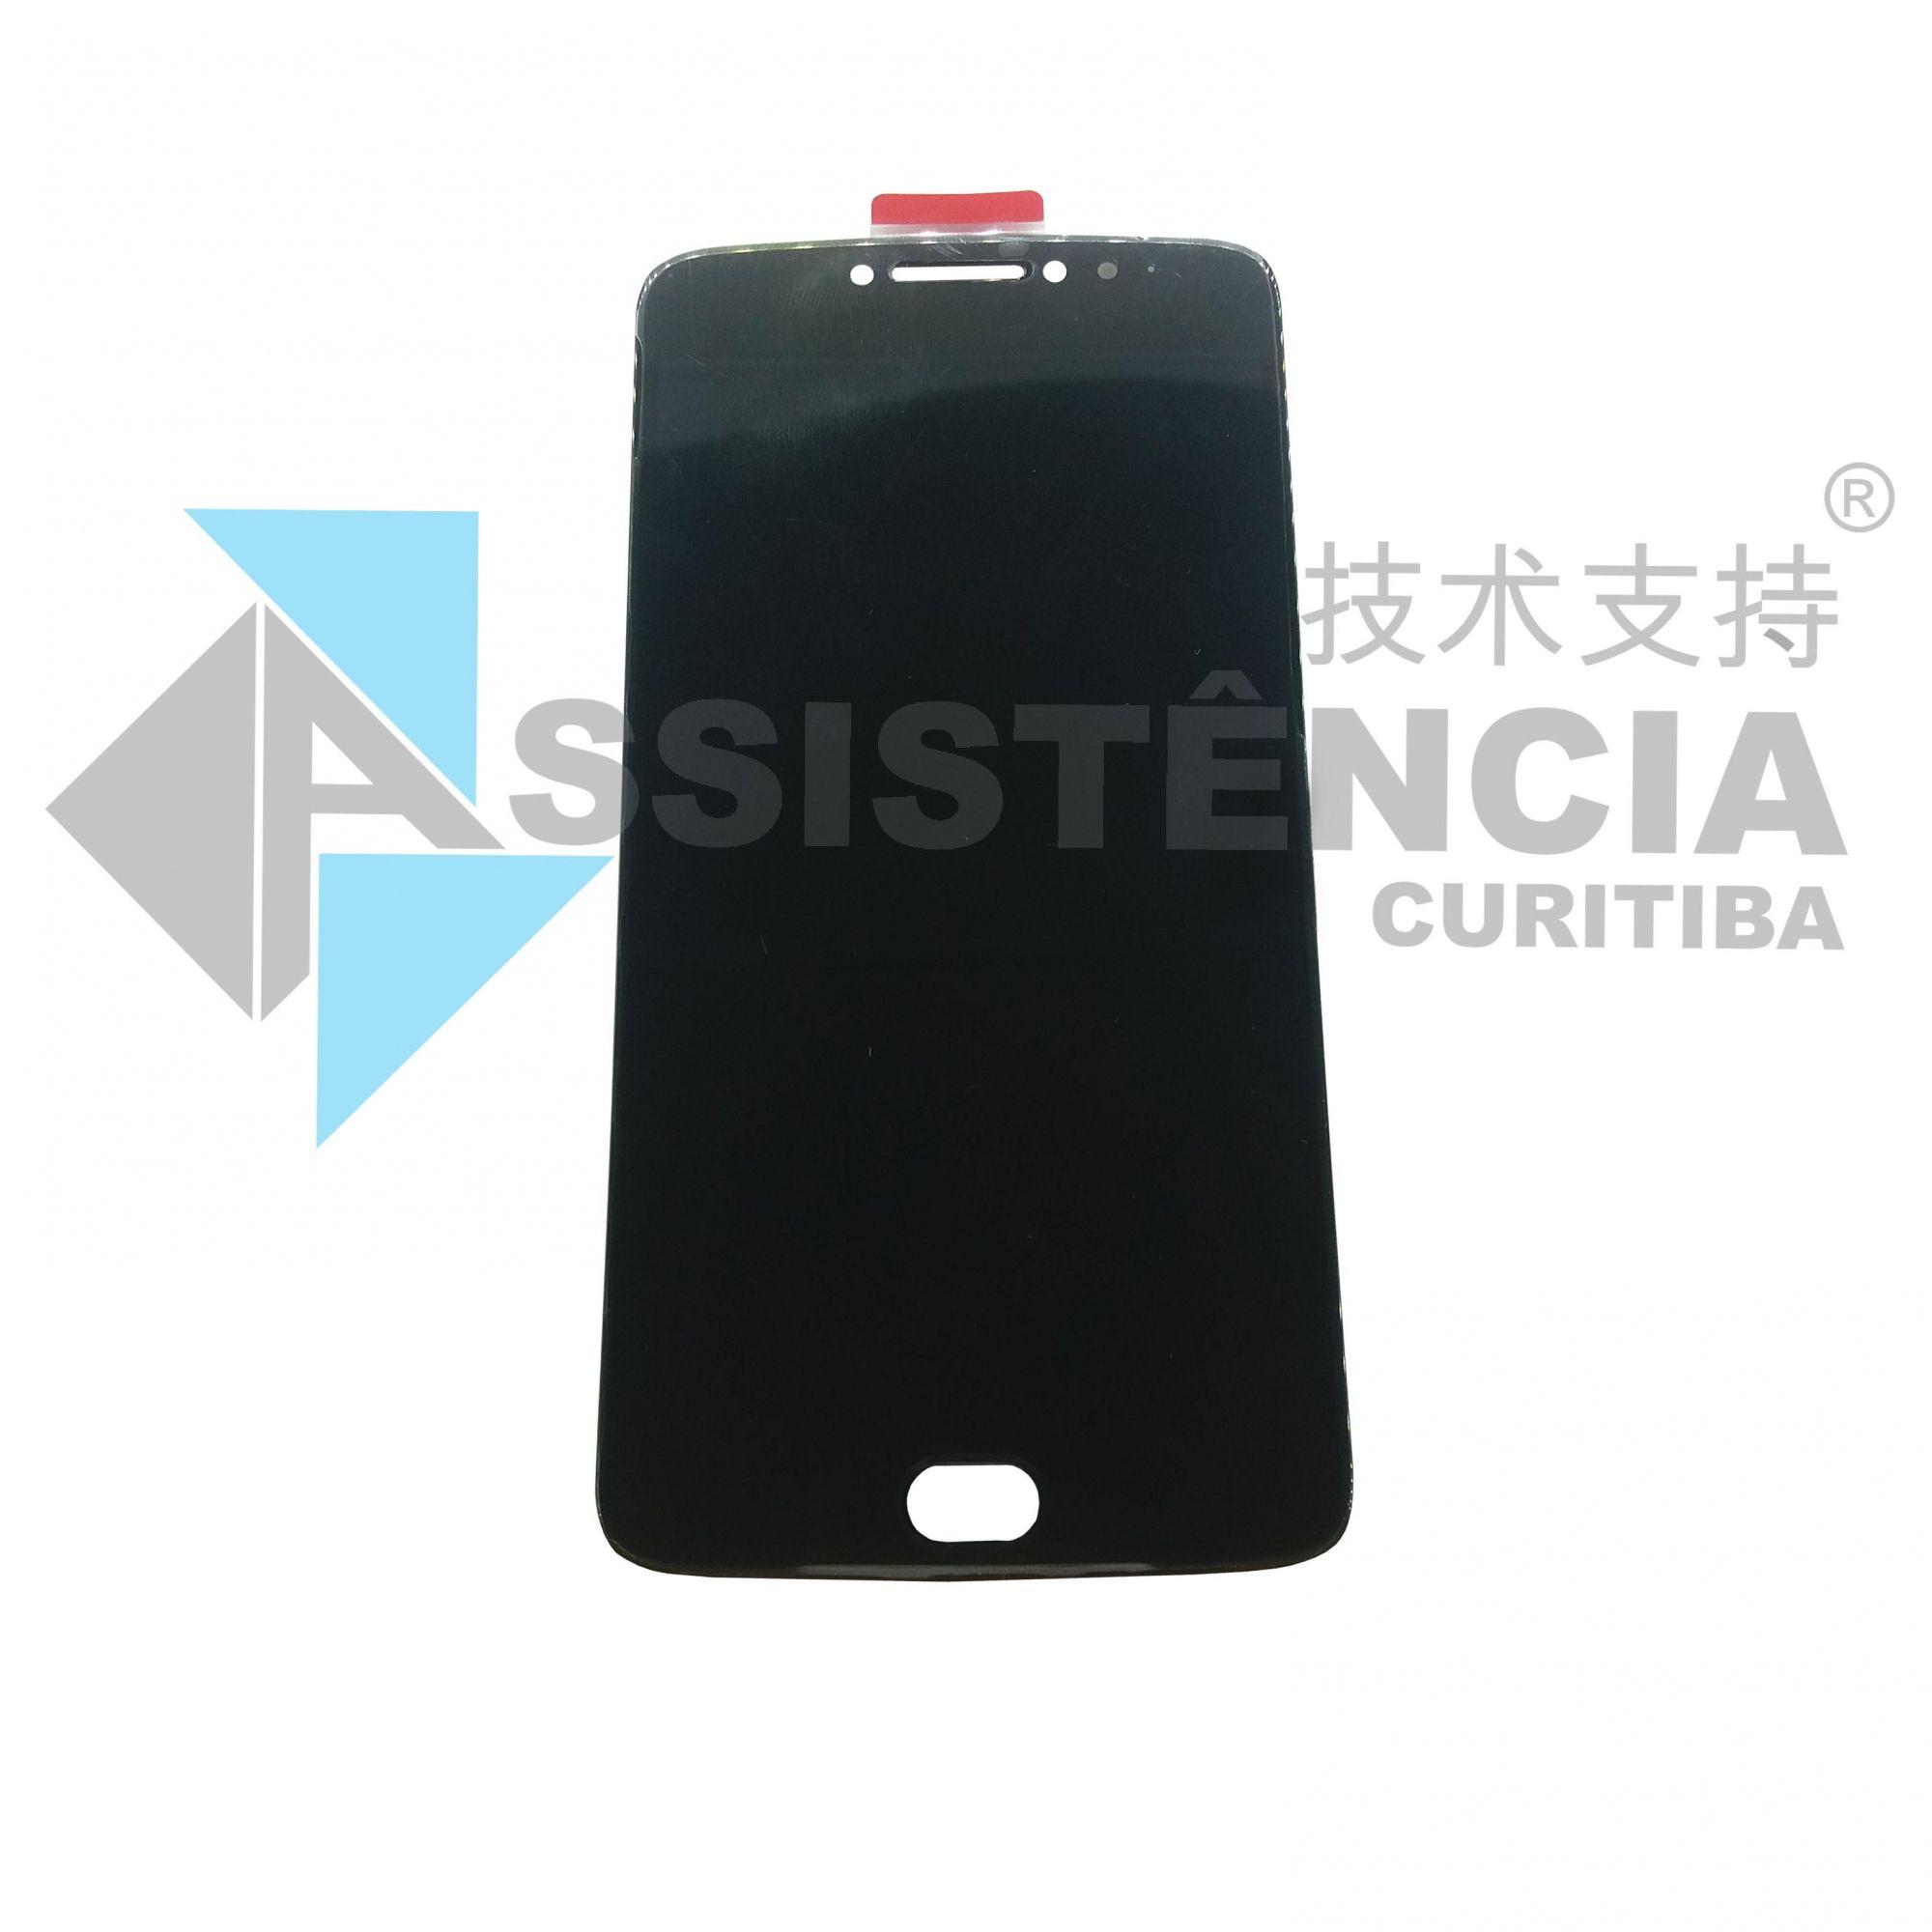 Tela Display Motorola Moto E4 Plus Xt1770 Xt1771 Xt1773 Preto